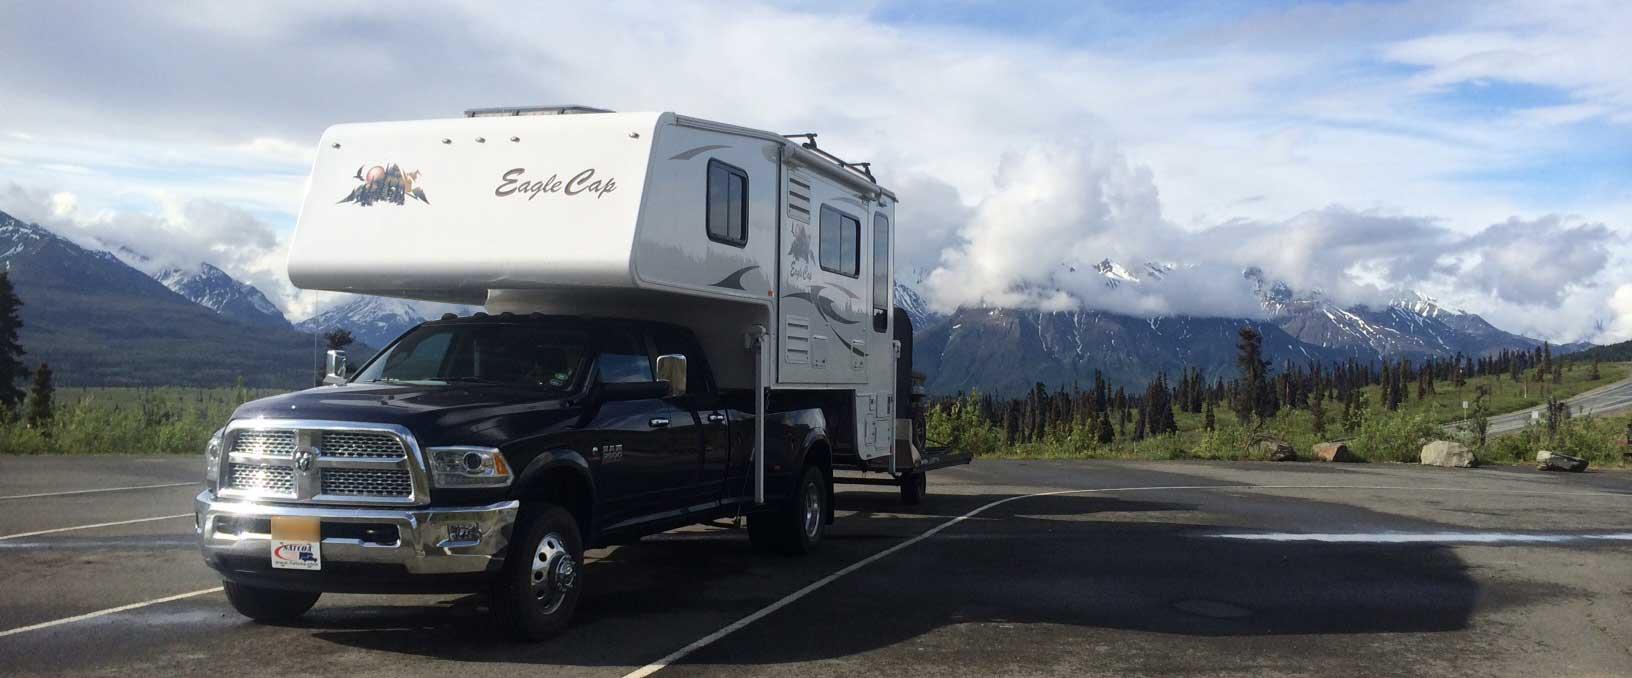 Camping in Knob Lake, Alaska